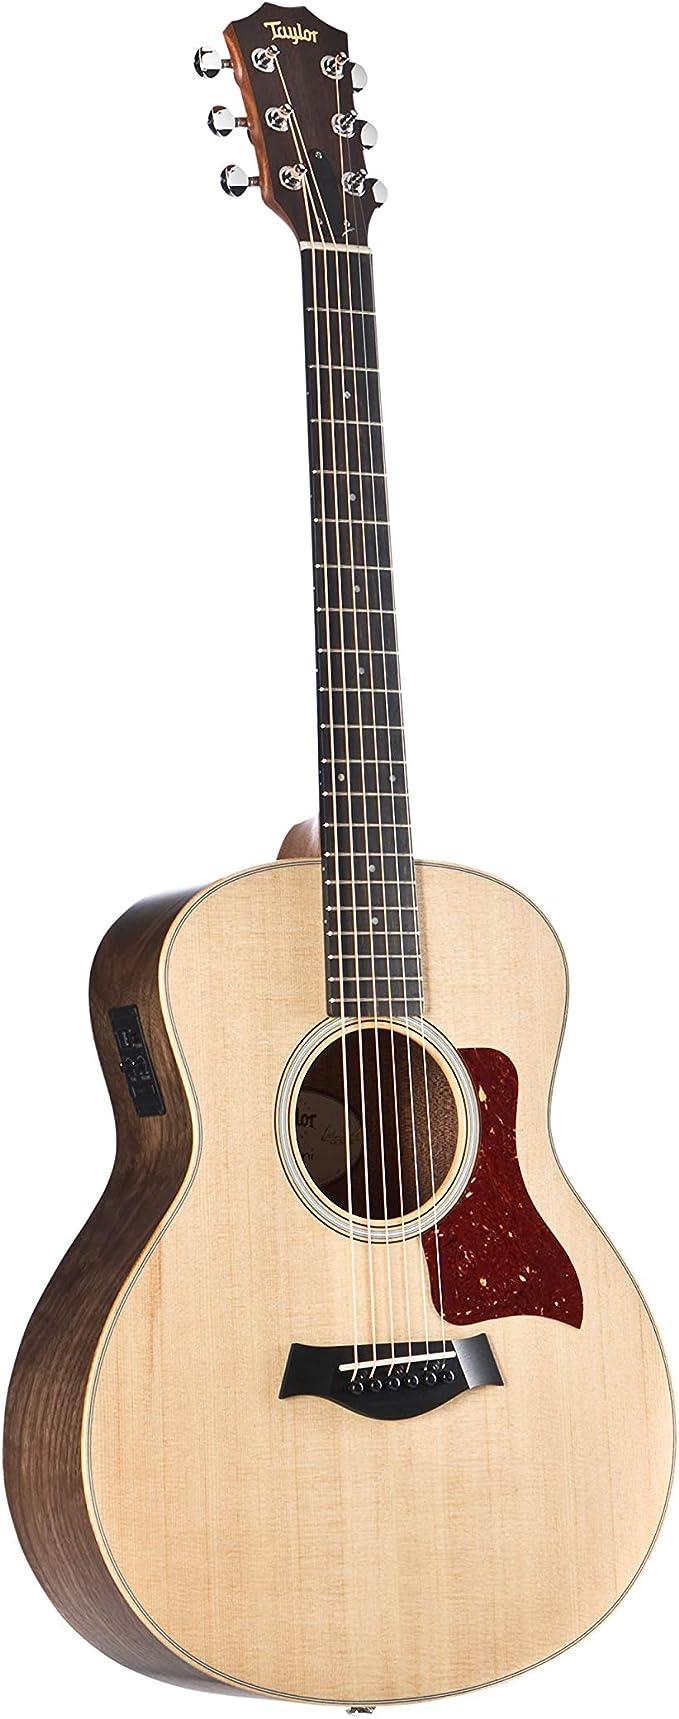 Taylor GS Mini-e Walnut/Spruce Acoustic-Electric Guitar Natural